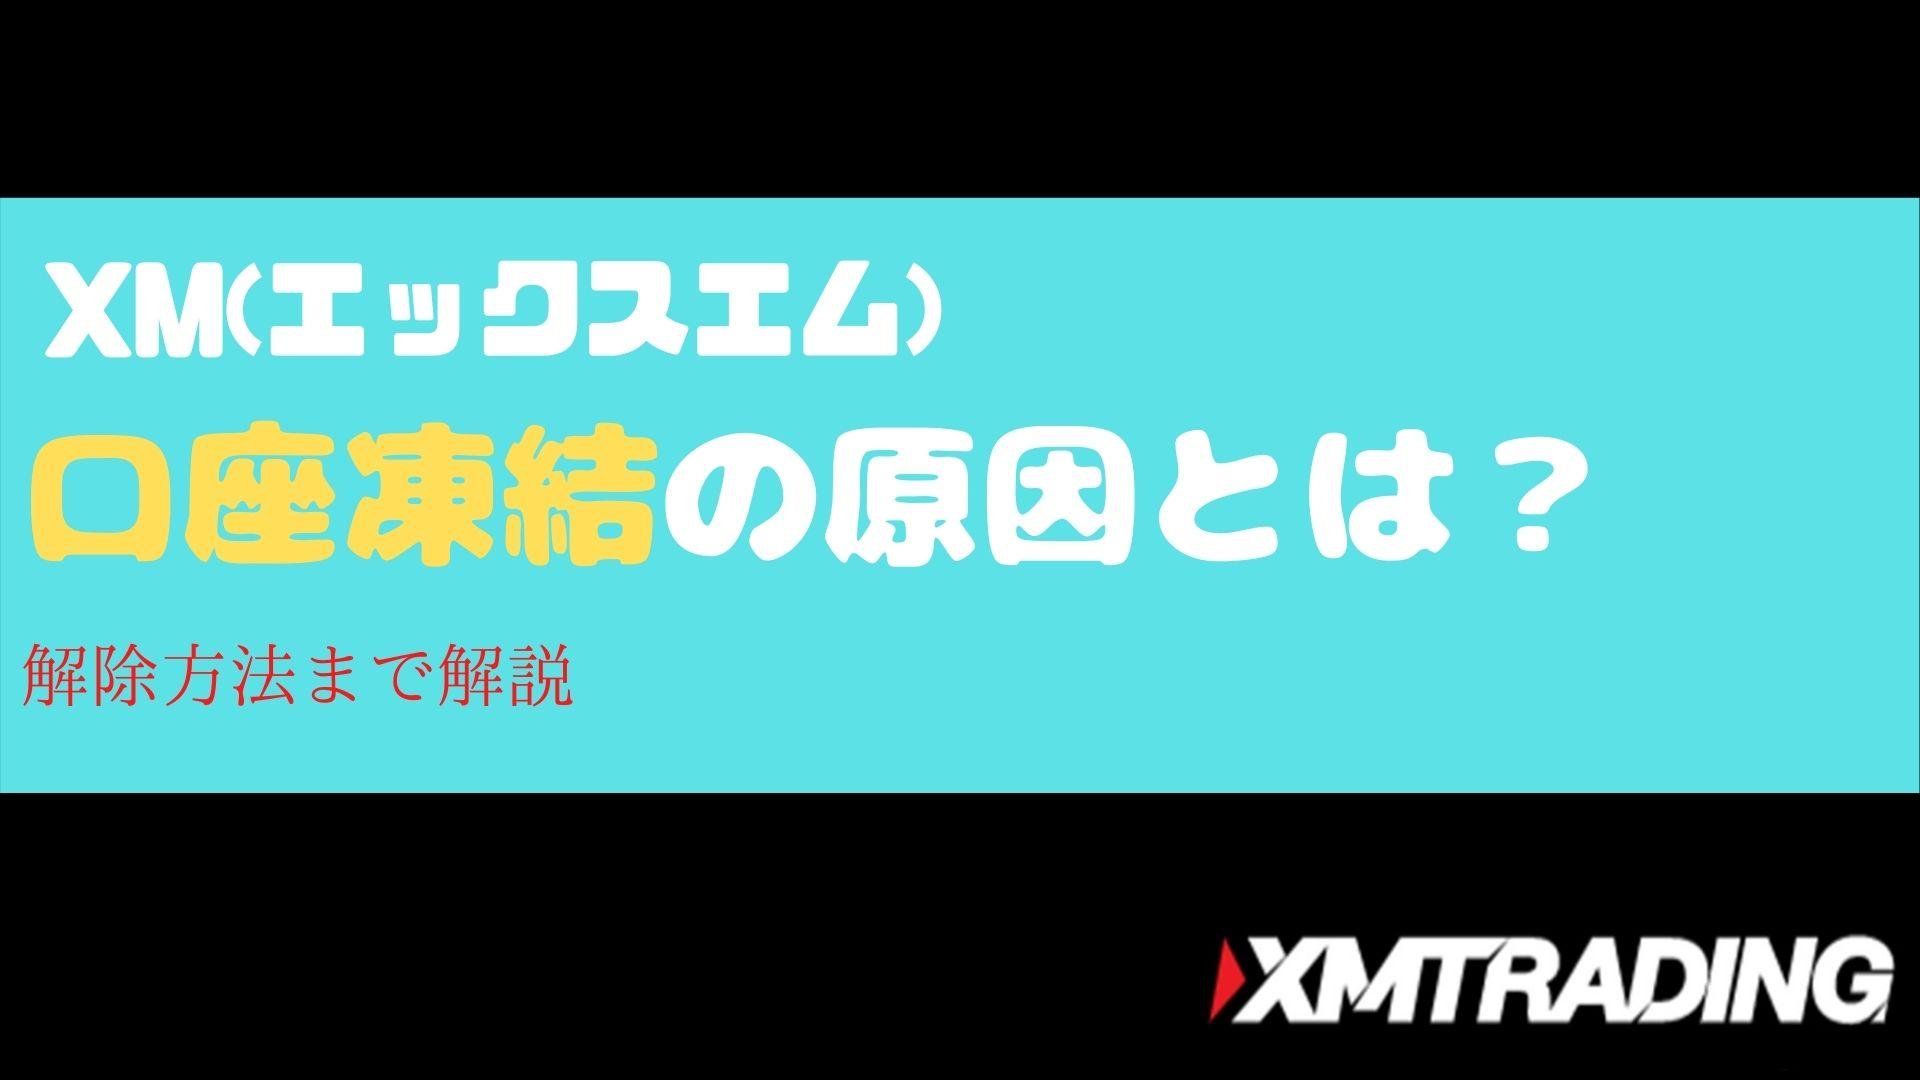 xm-account-freeze-title